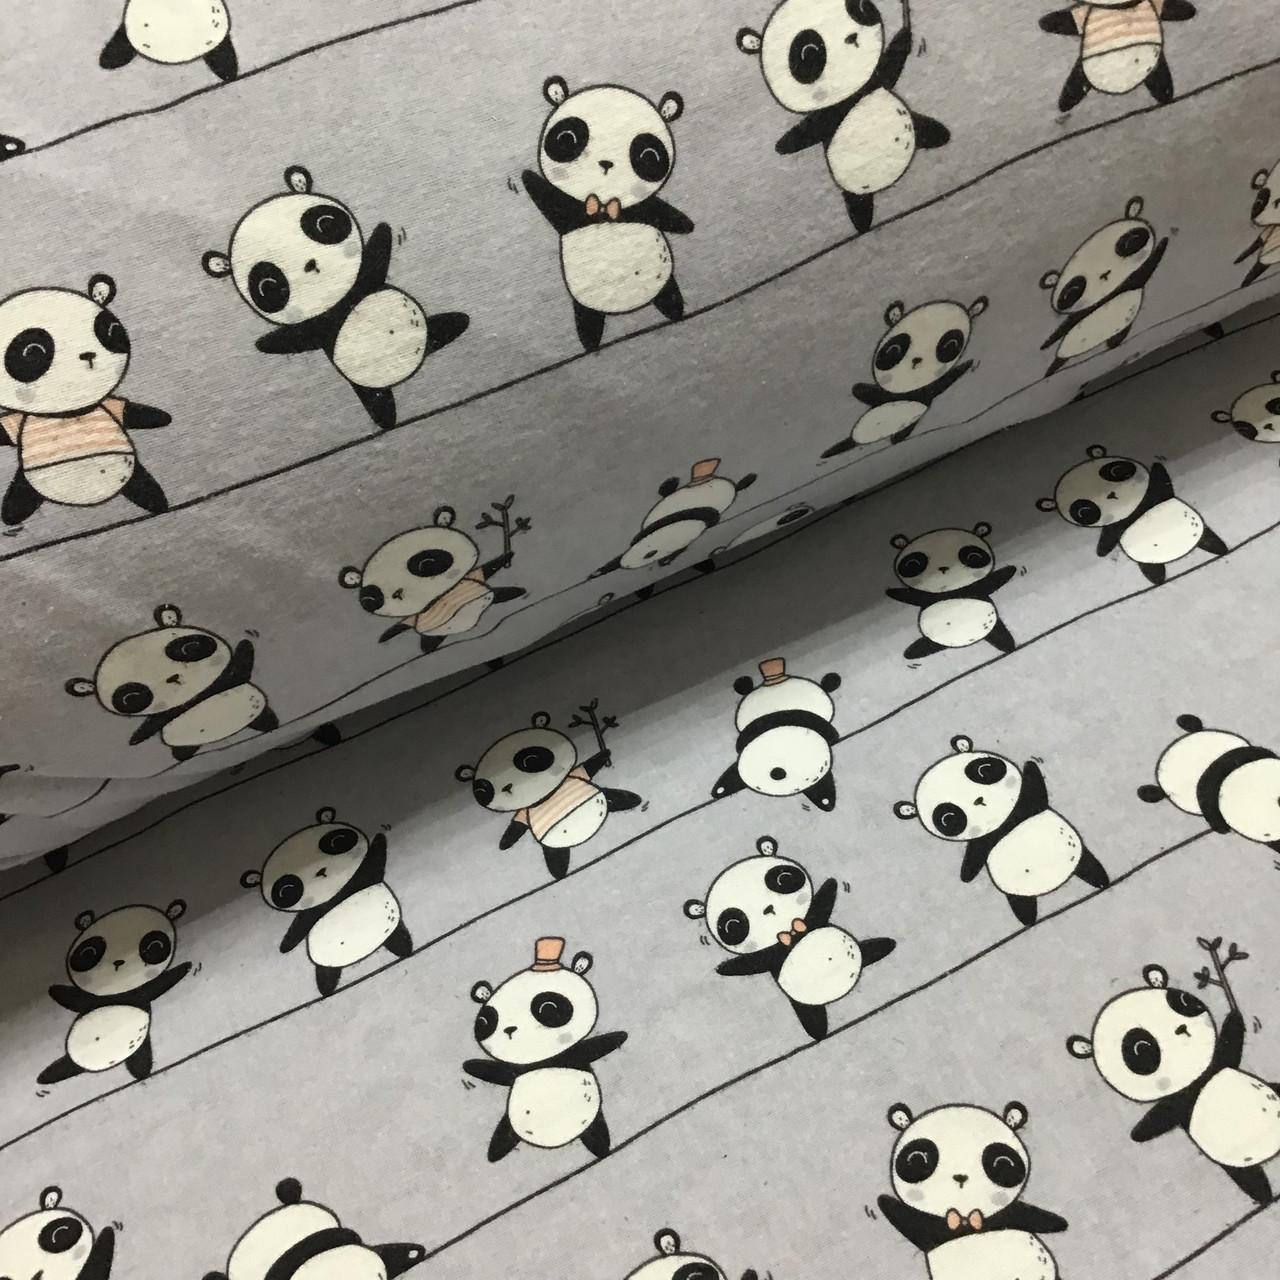 Фланелевая ткань панды на полоске на сером